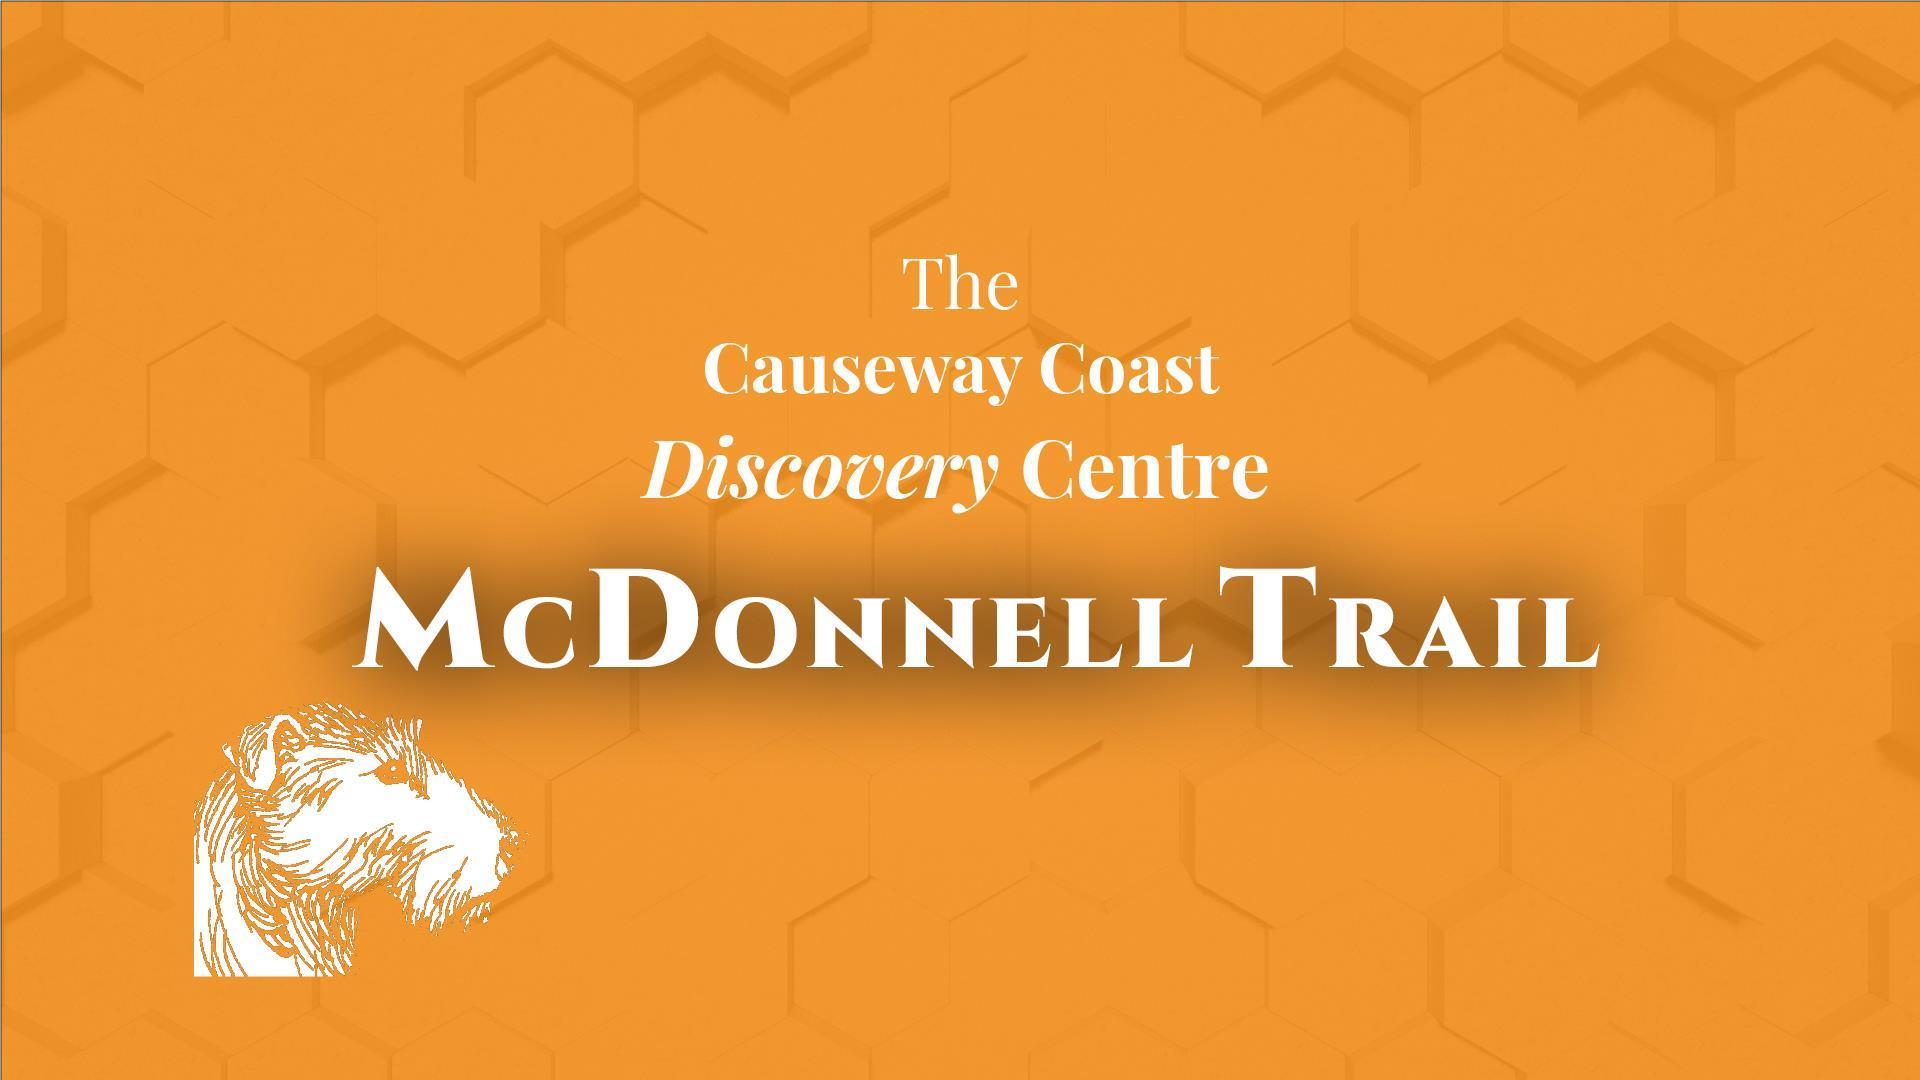 The McDonnell Trail Tour